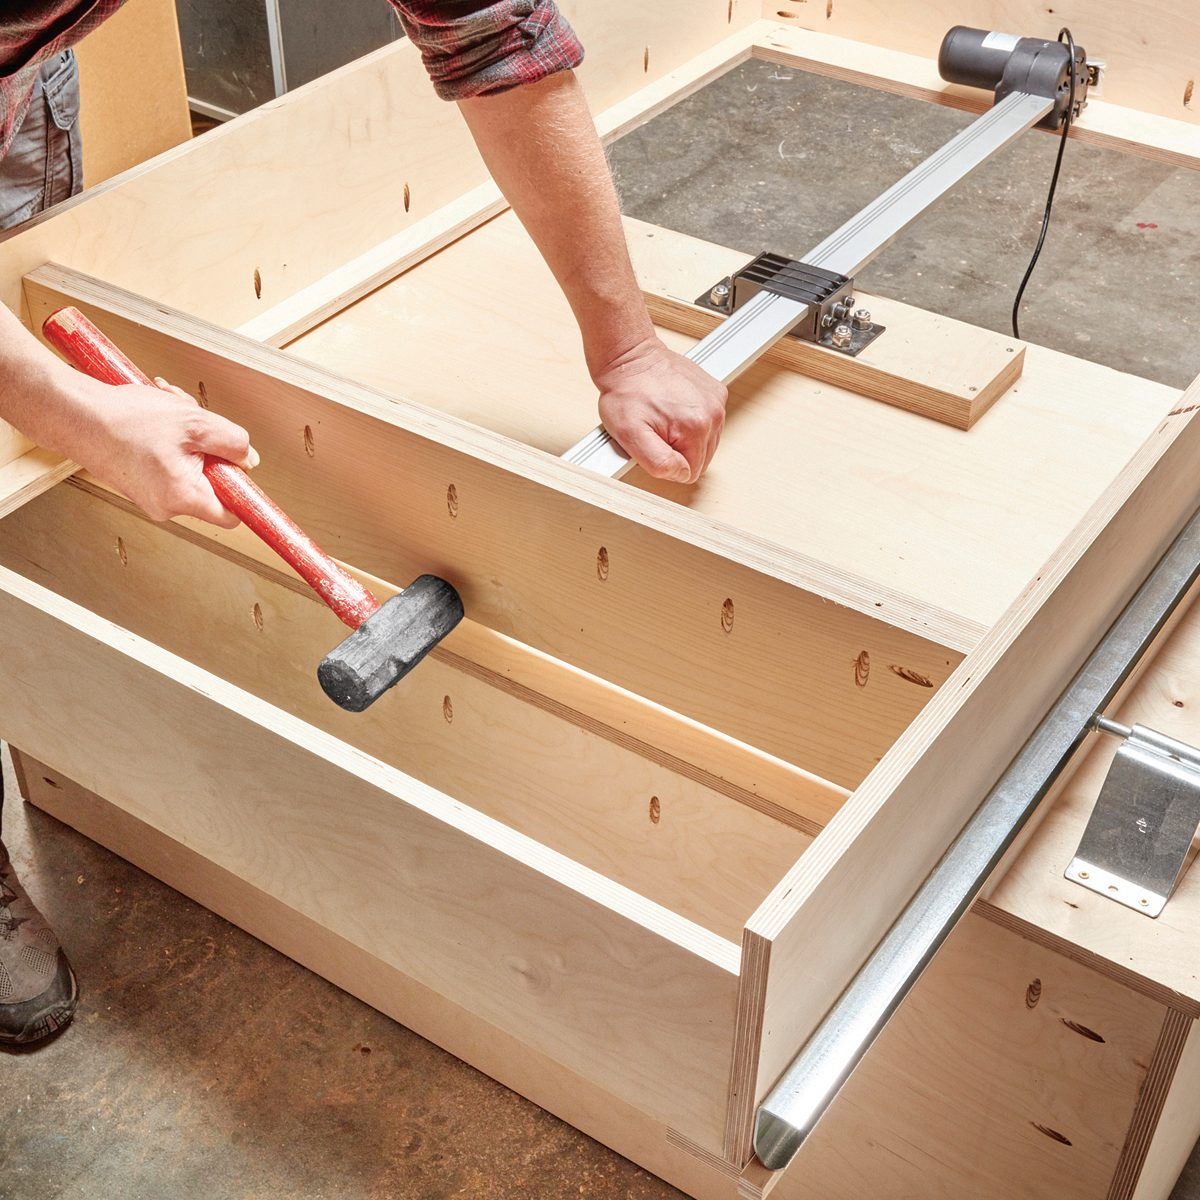 Setting the bulkhead